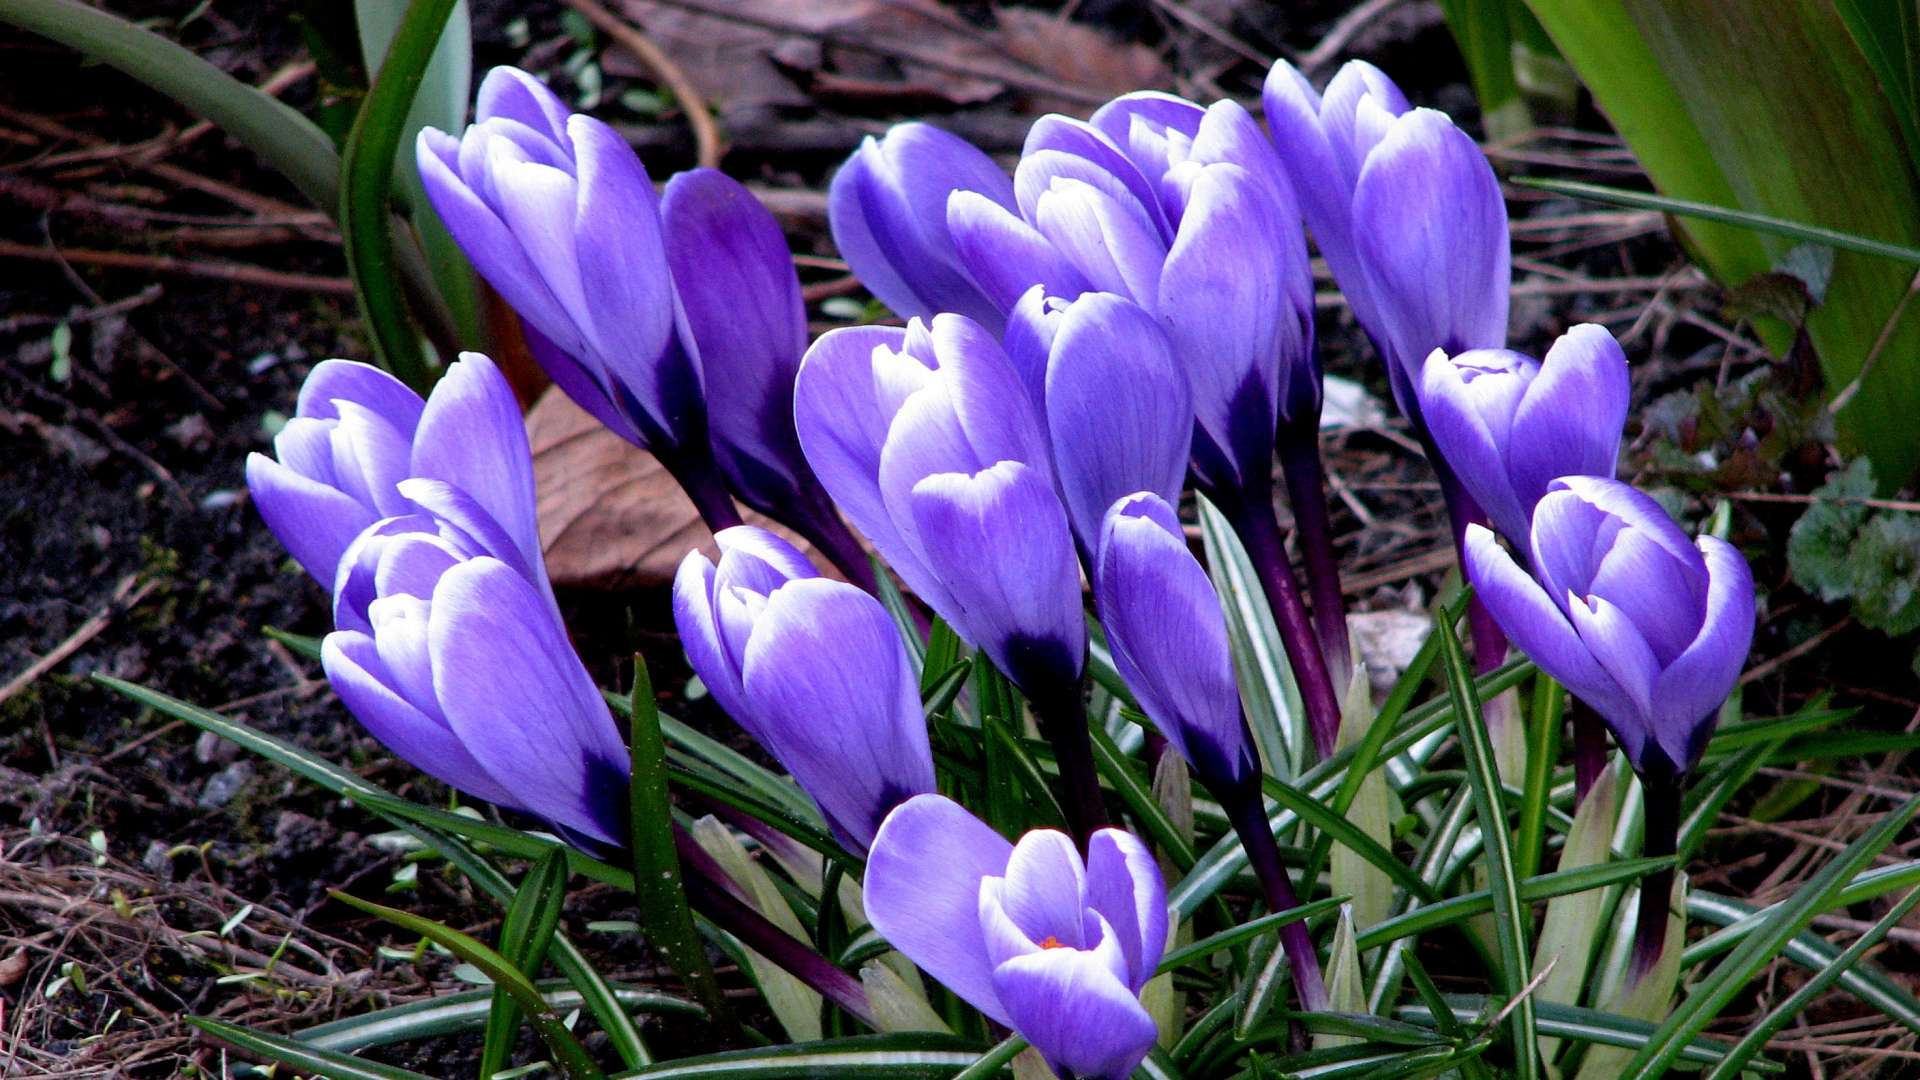 Geliebte HD Hintergrundbilder krokus gras erde frühling blüten blau &SI_49